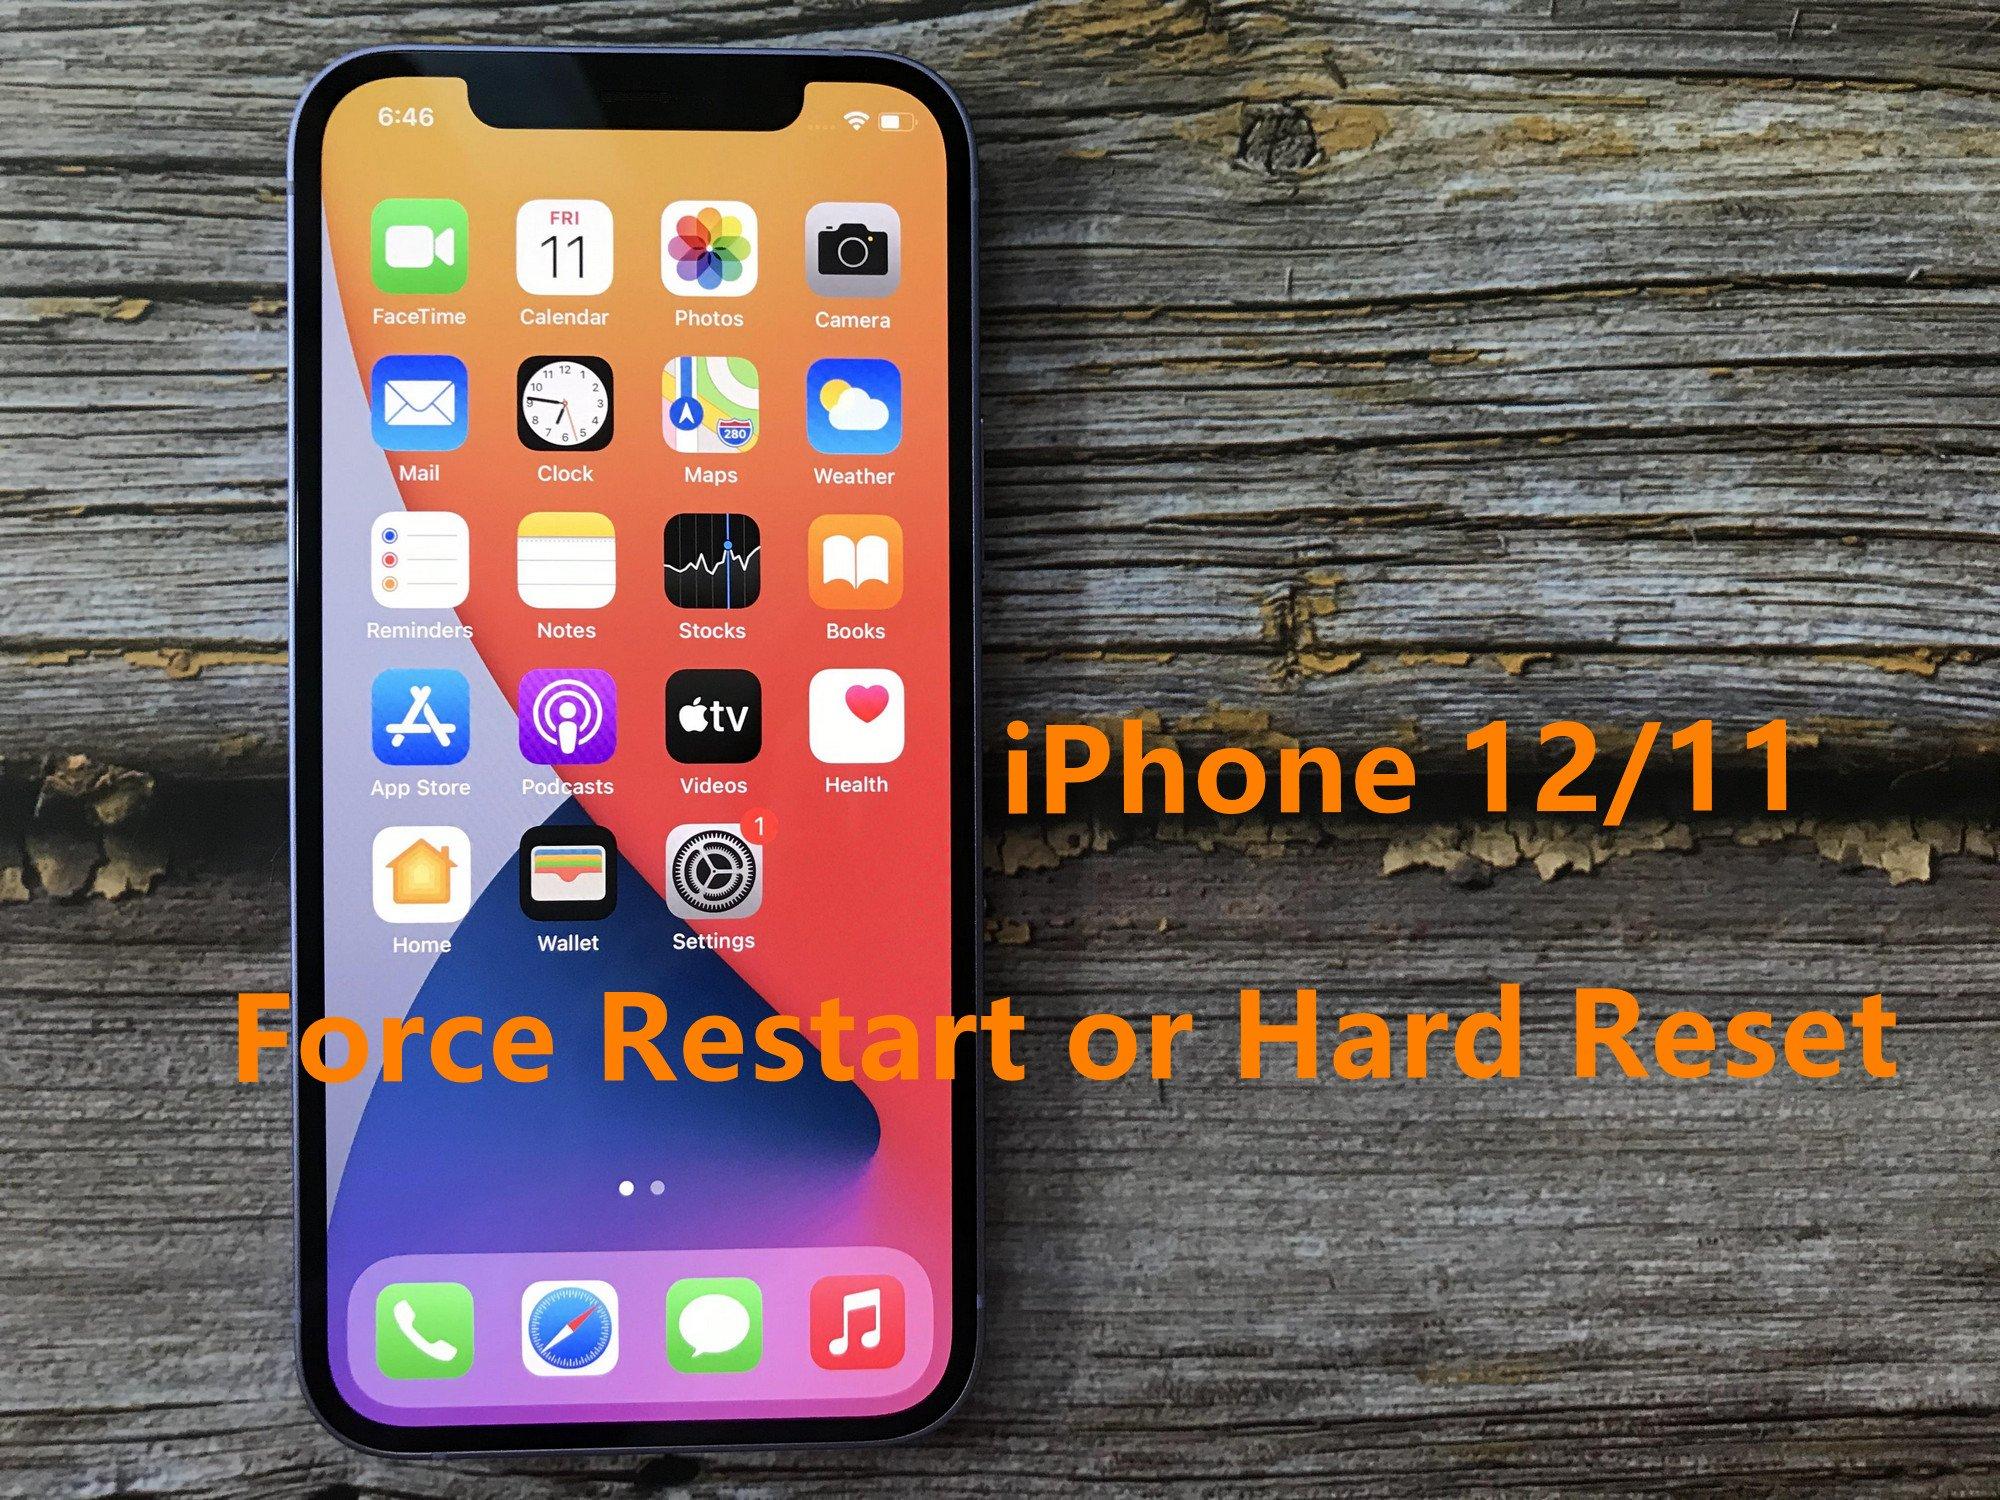 Force Restart Or Hard Reset Iphone 12 11